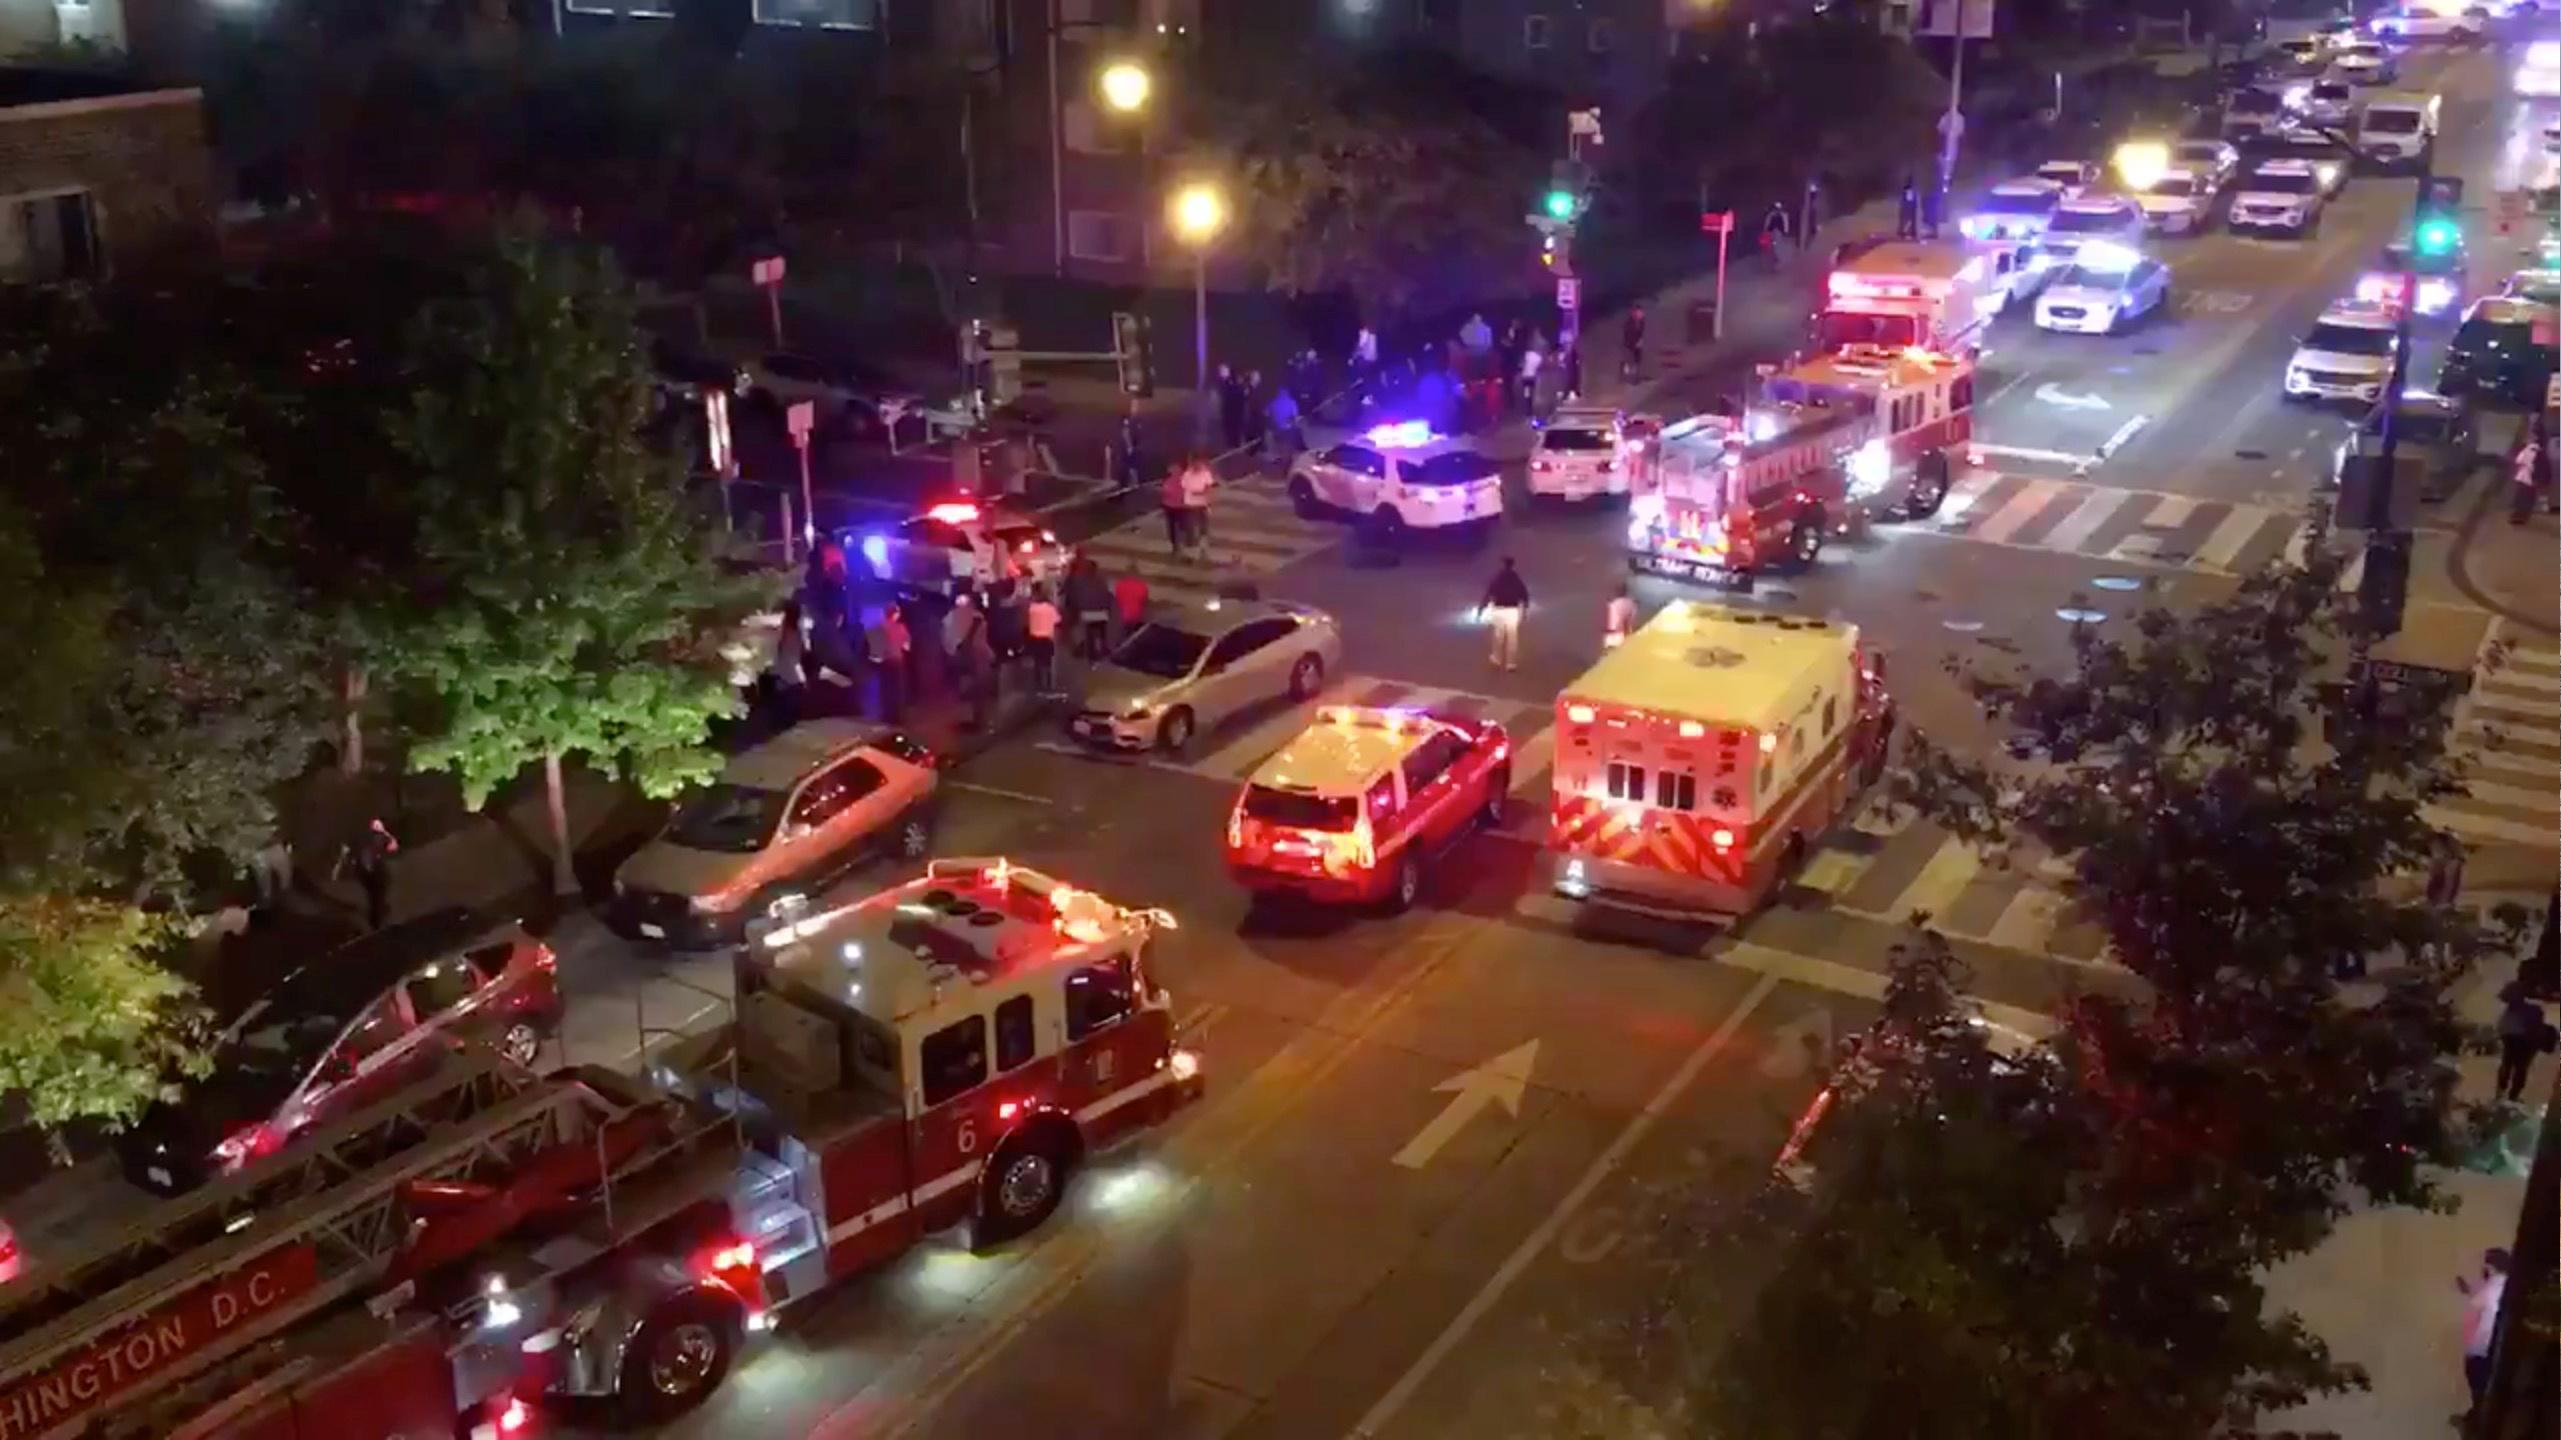 One dead, five hurt in Washington, D.C. shooting: police